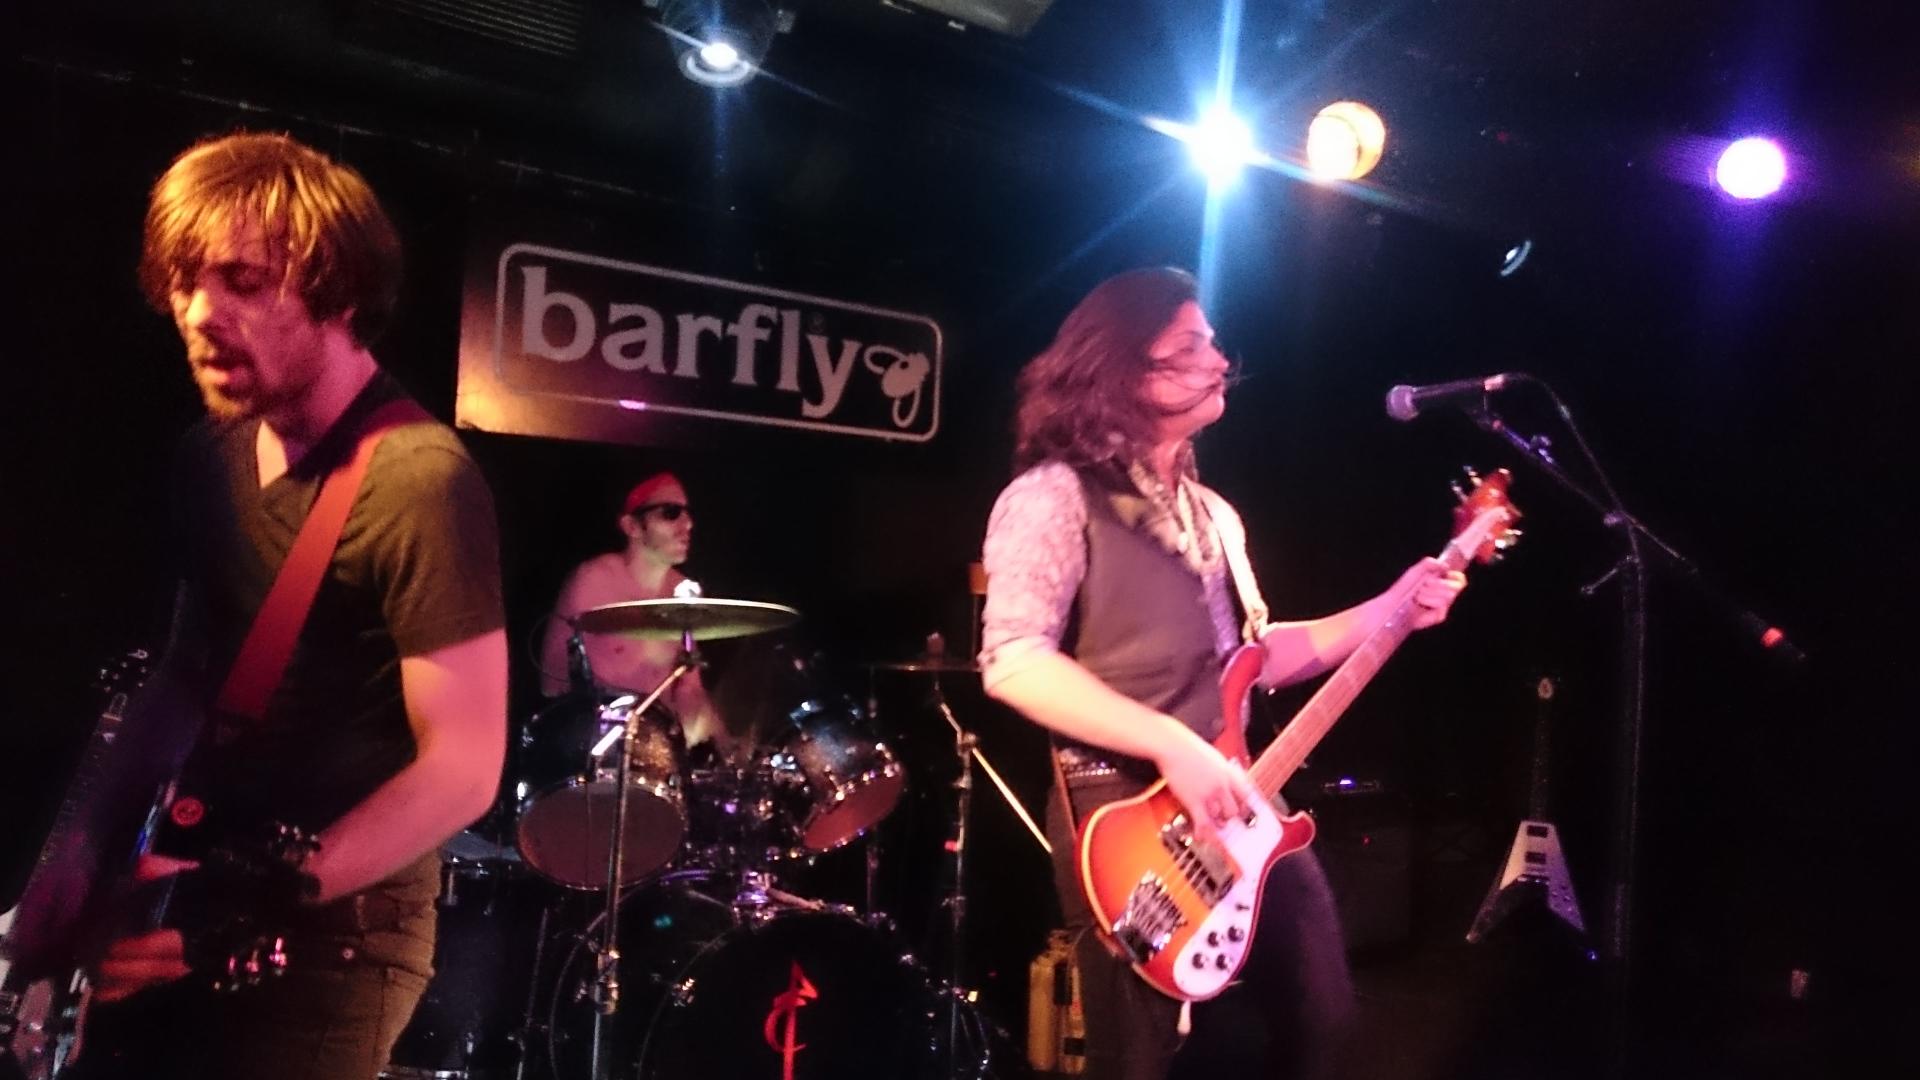 Barfly gig...